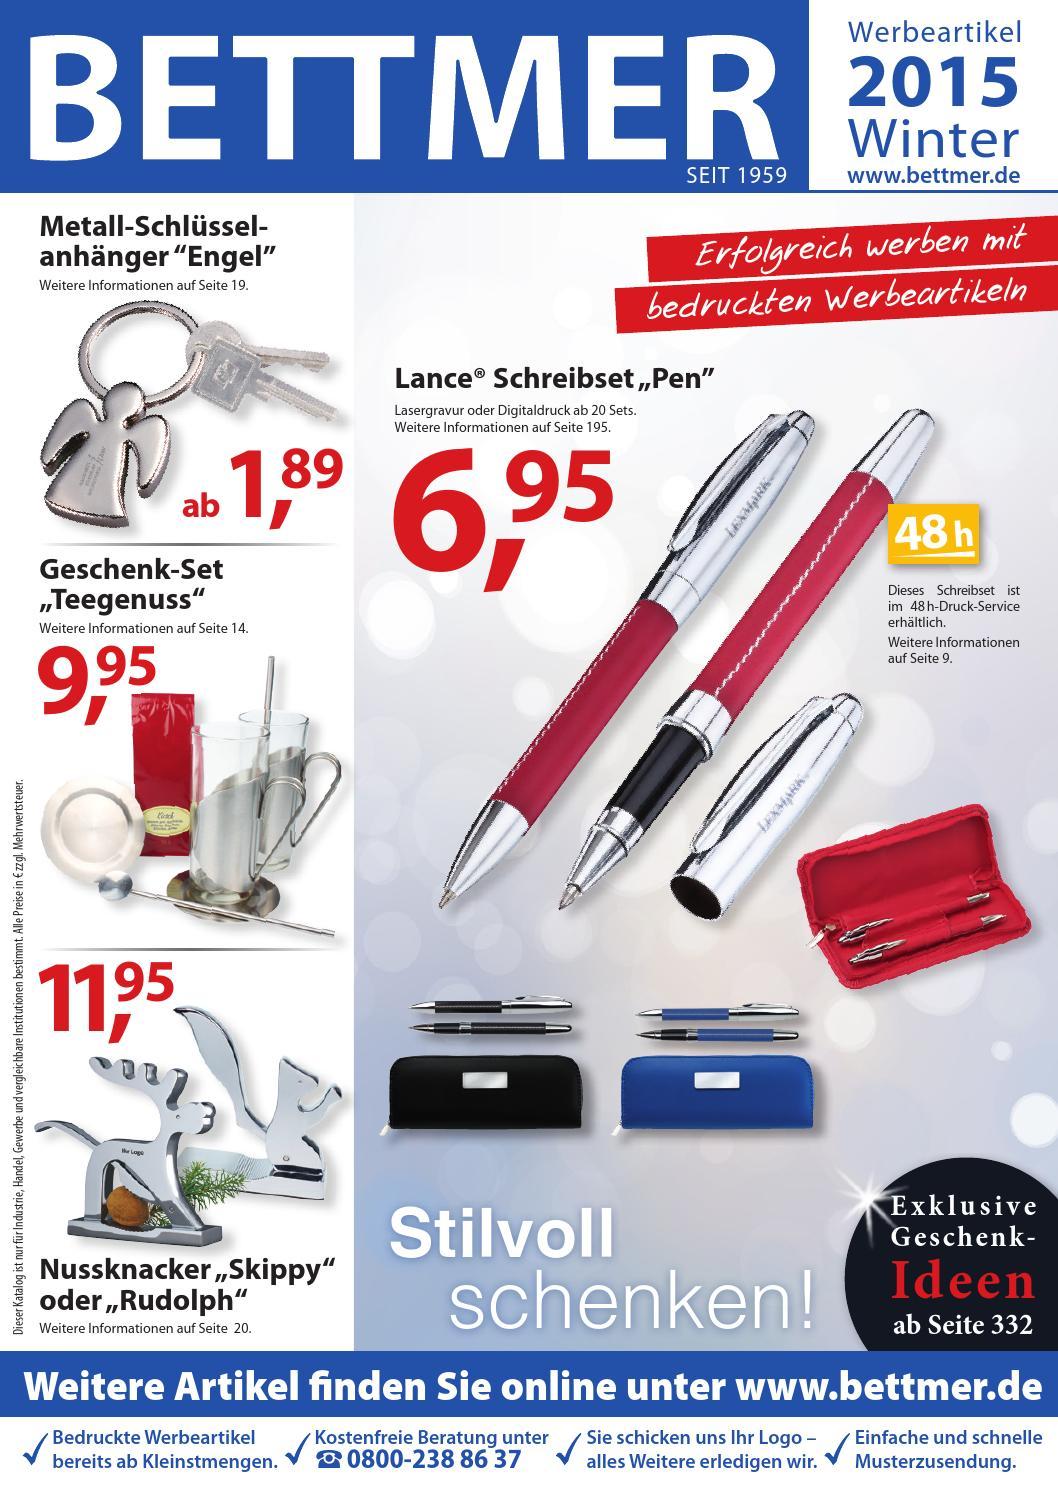 Bettmer Katalog Werbeartikel Winter 2015 by Bettmer GmbH - issuu